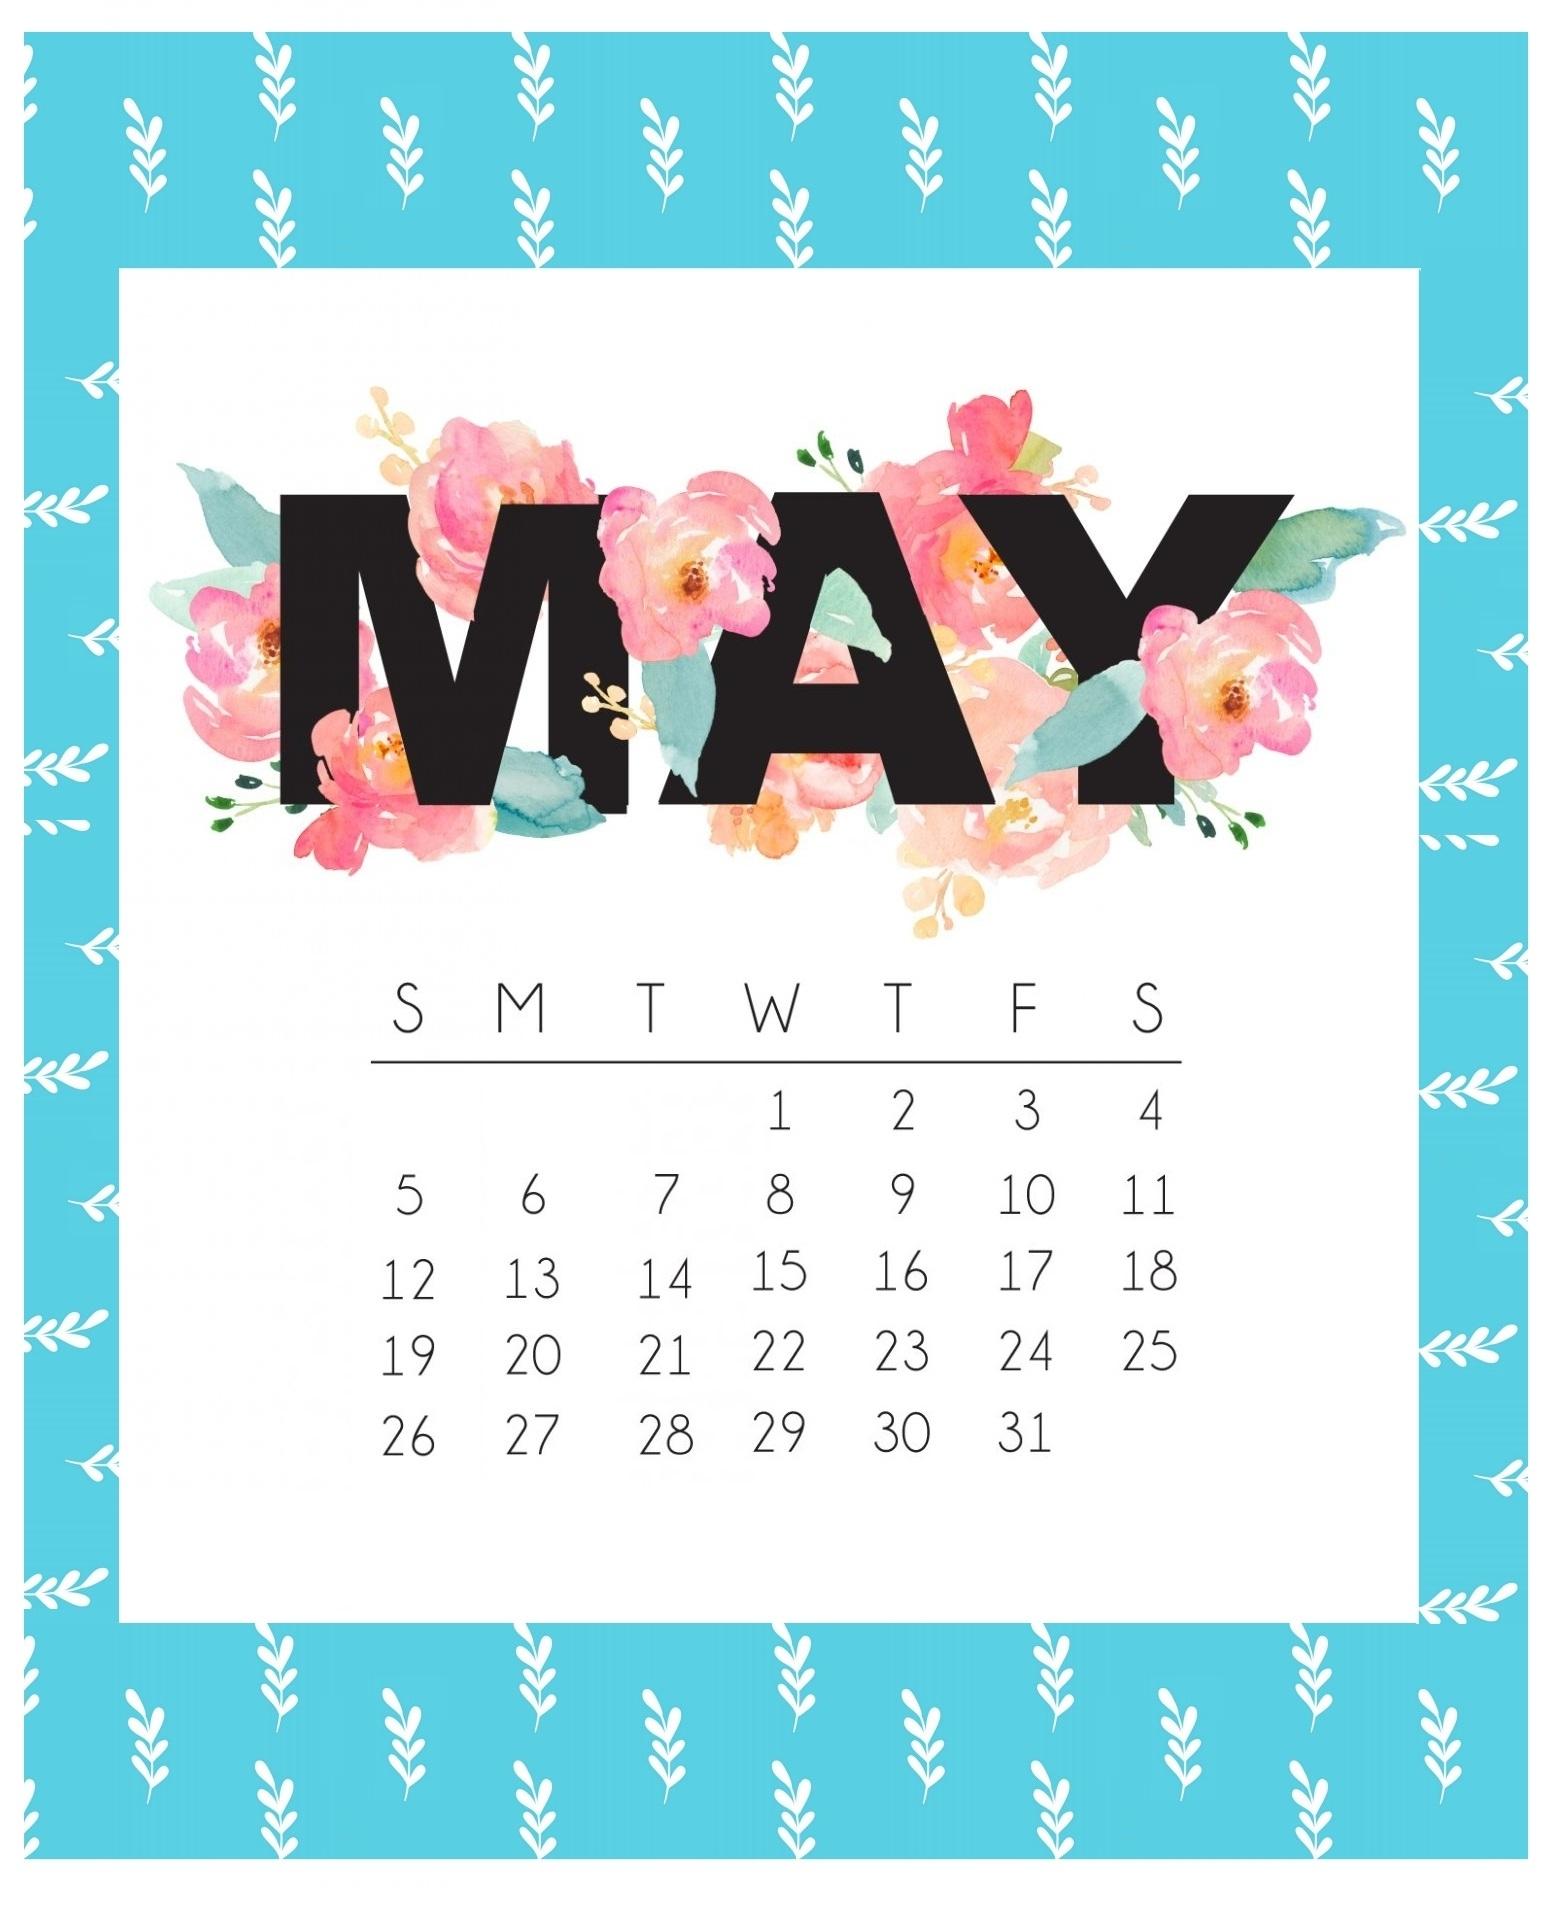 Cute May 2019 Calendar Printable Floral Design